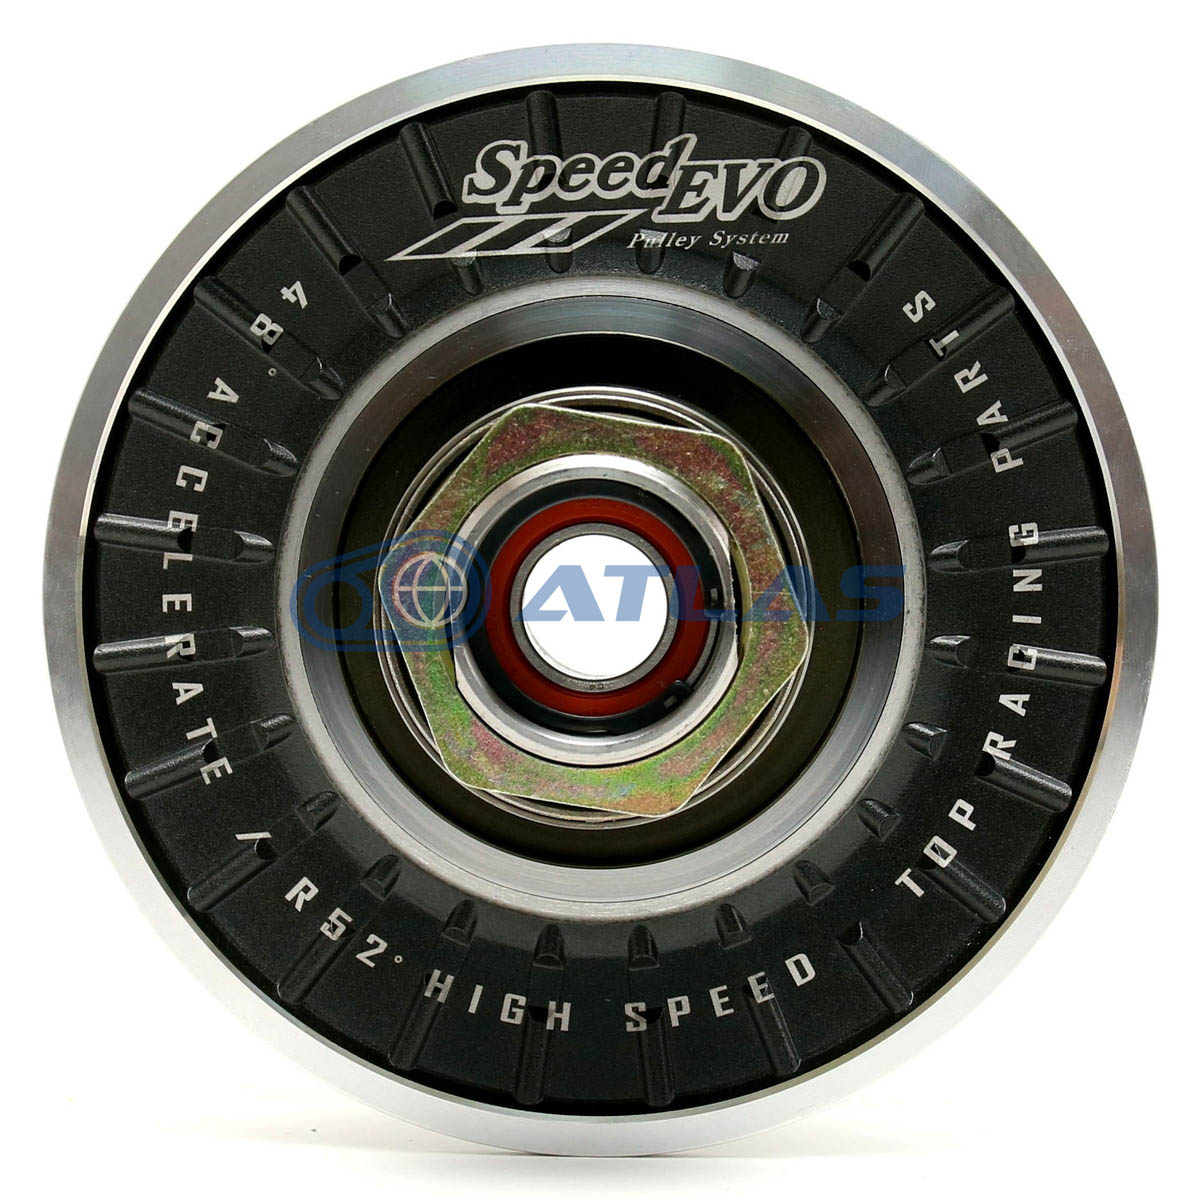 Speed EVO 4型 5型シグナスX(CYGNUS X)アルミドリブンプーリー タイプ 直溝タイプSG